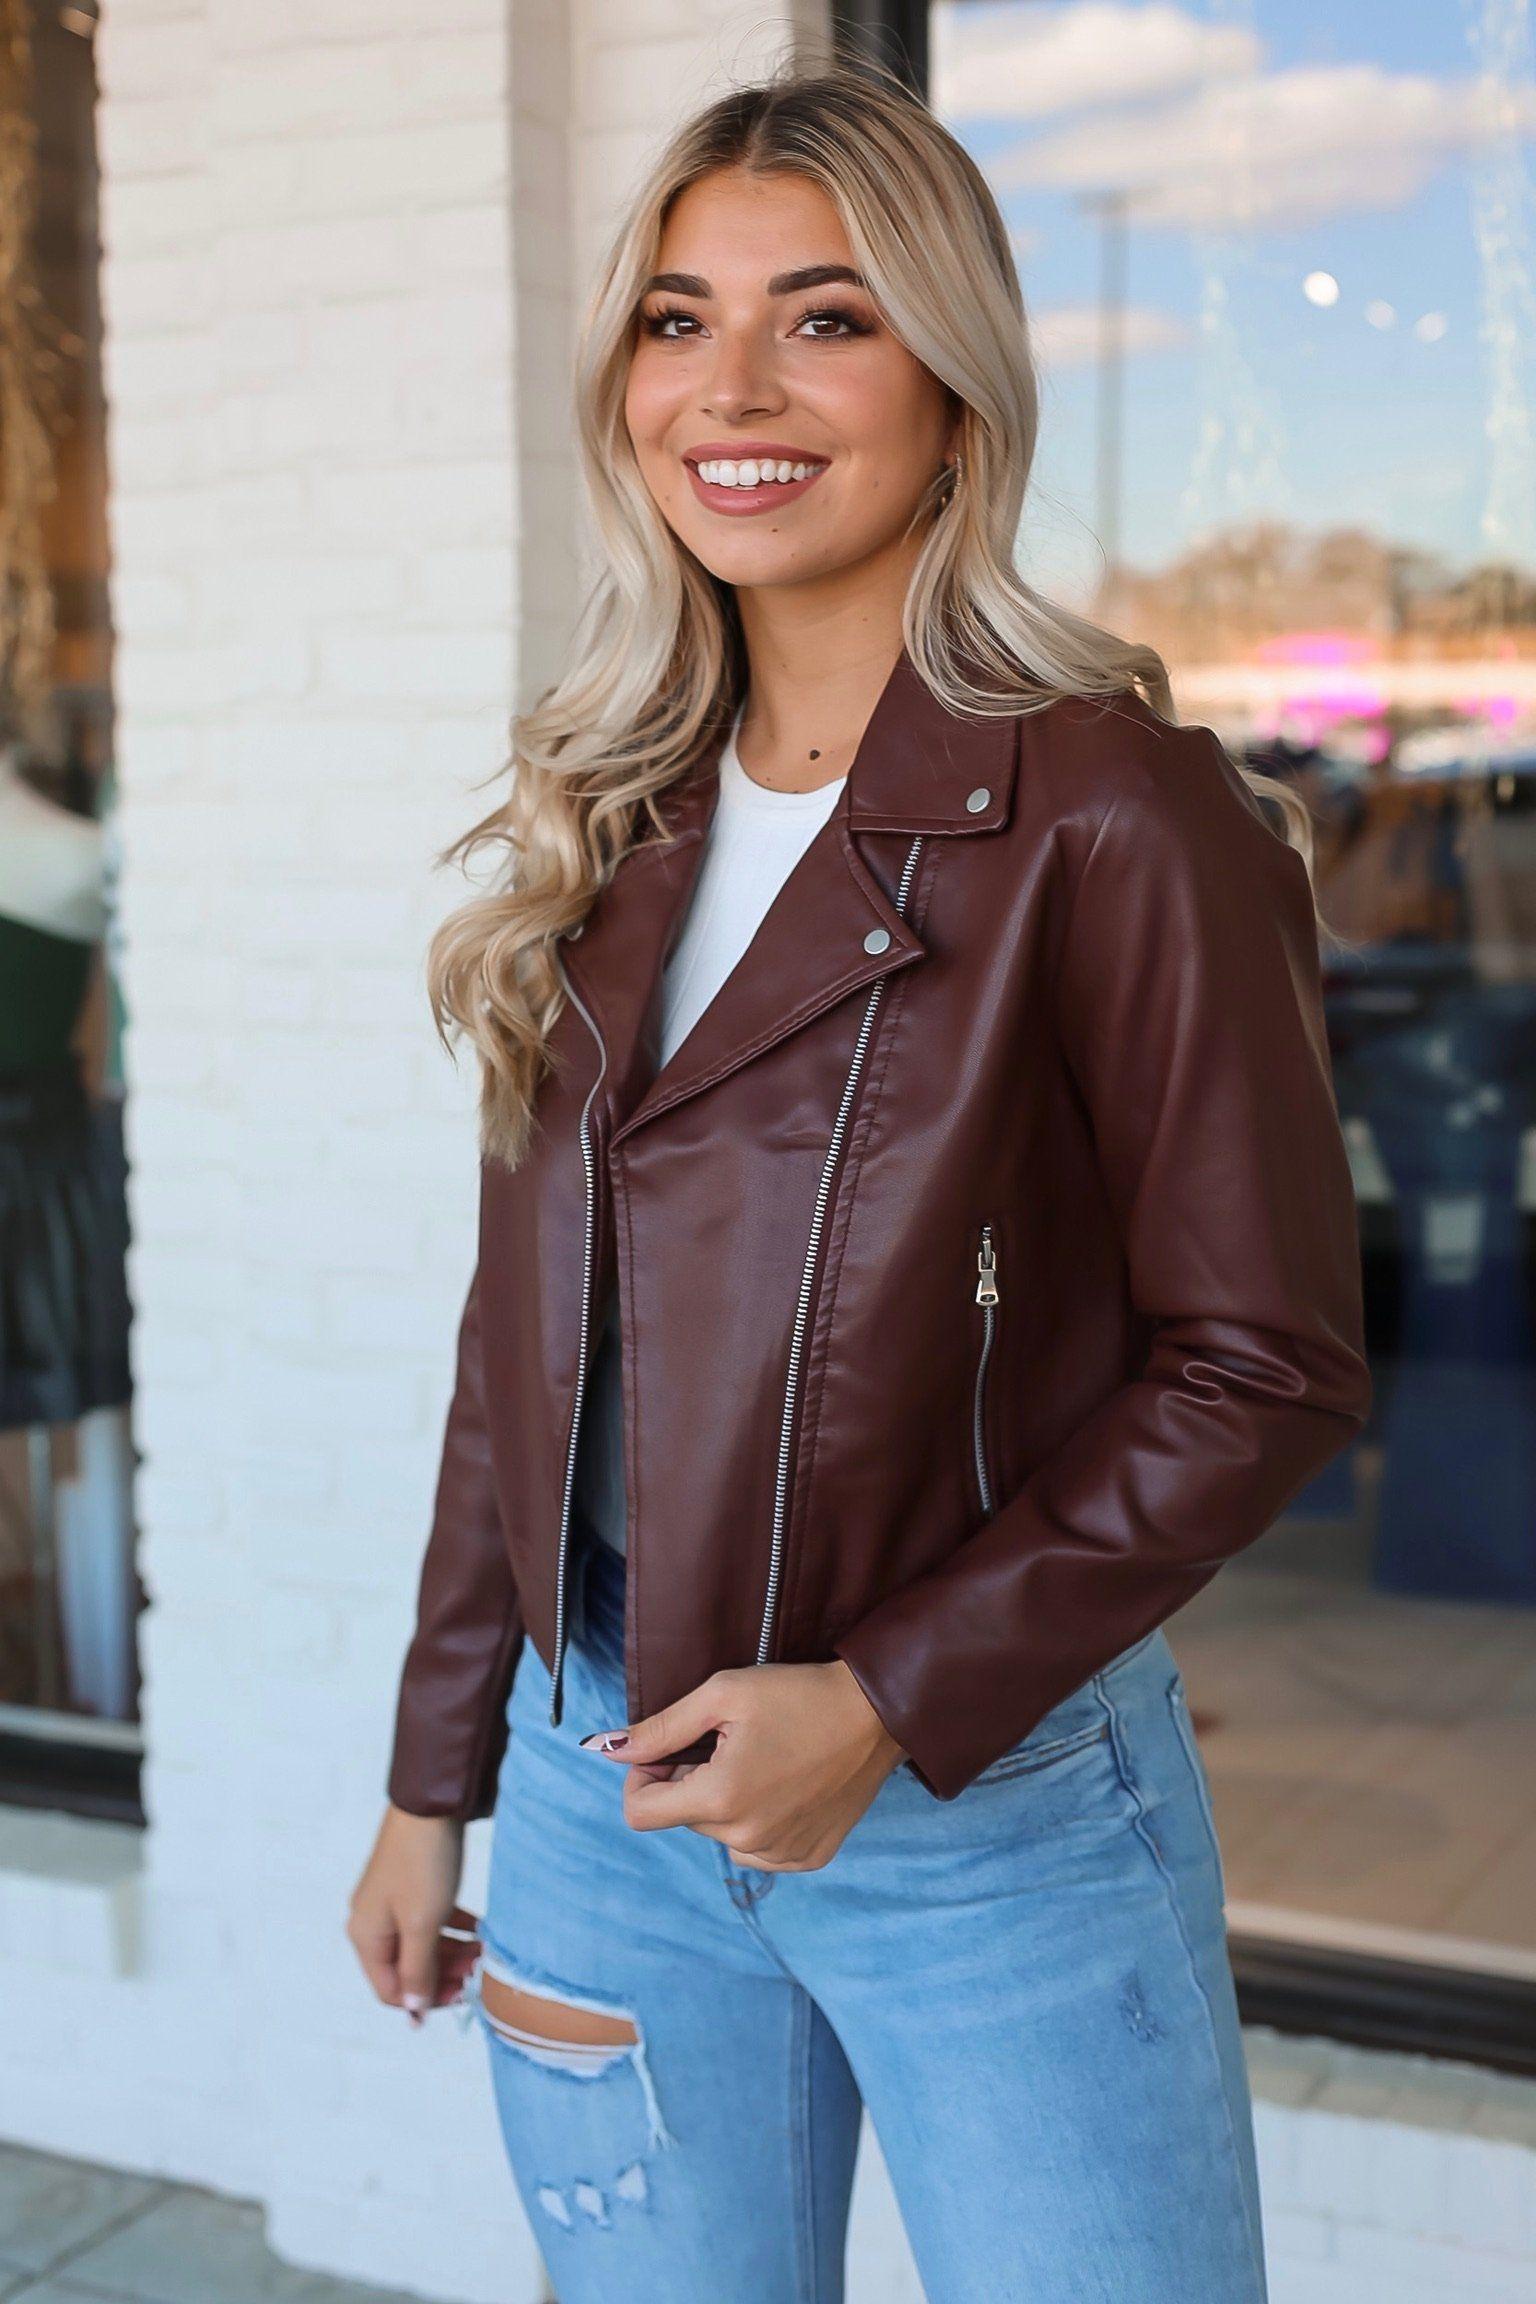 Frankie Faux Leather Jacket Brown S Leather Jacket Outfits Leather Jackets Women Dark Brown Leather Jacket [ 2304 x 1536 Pixel ]